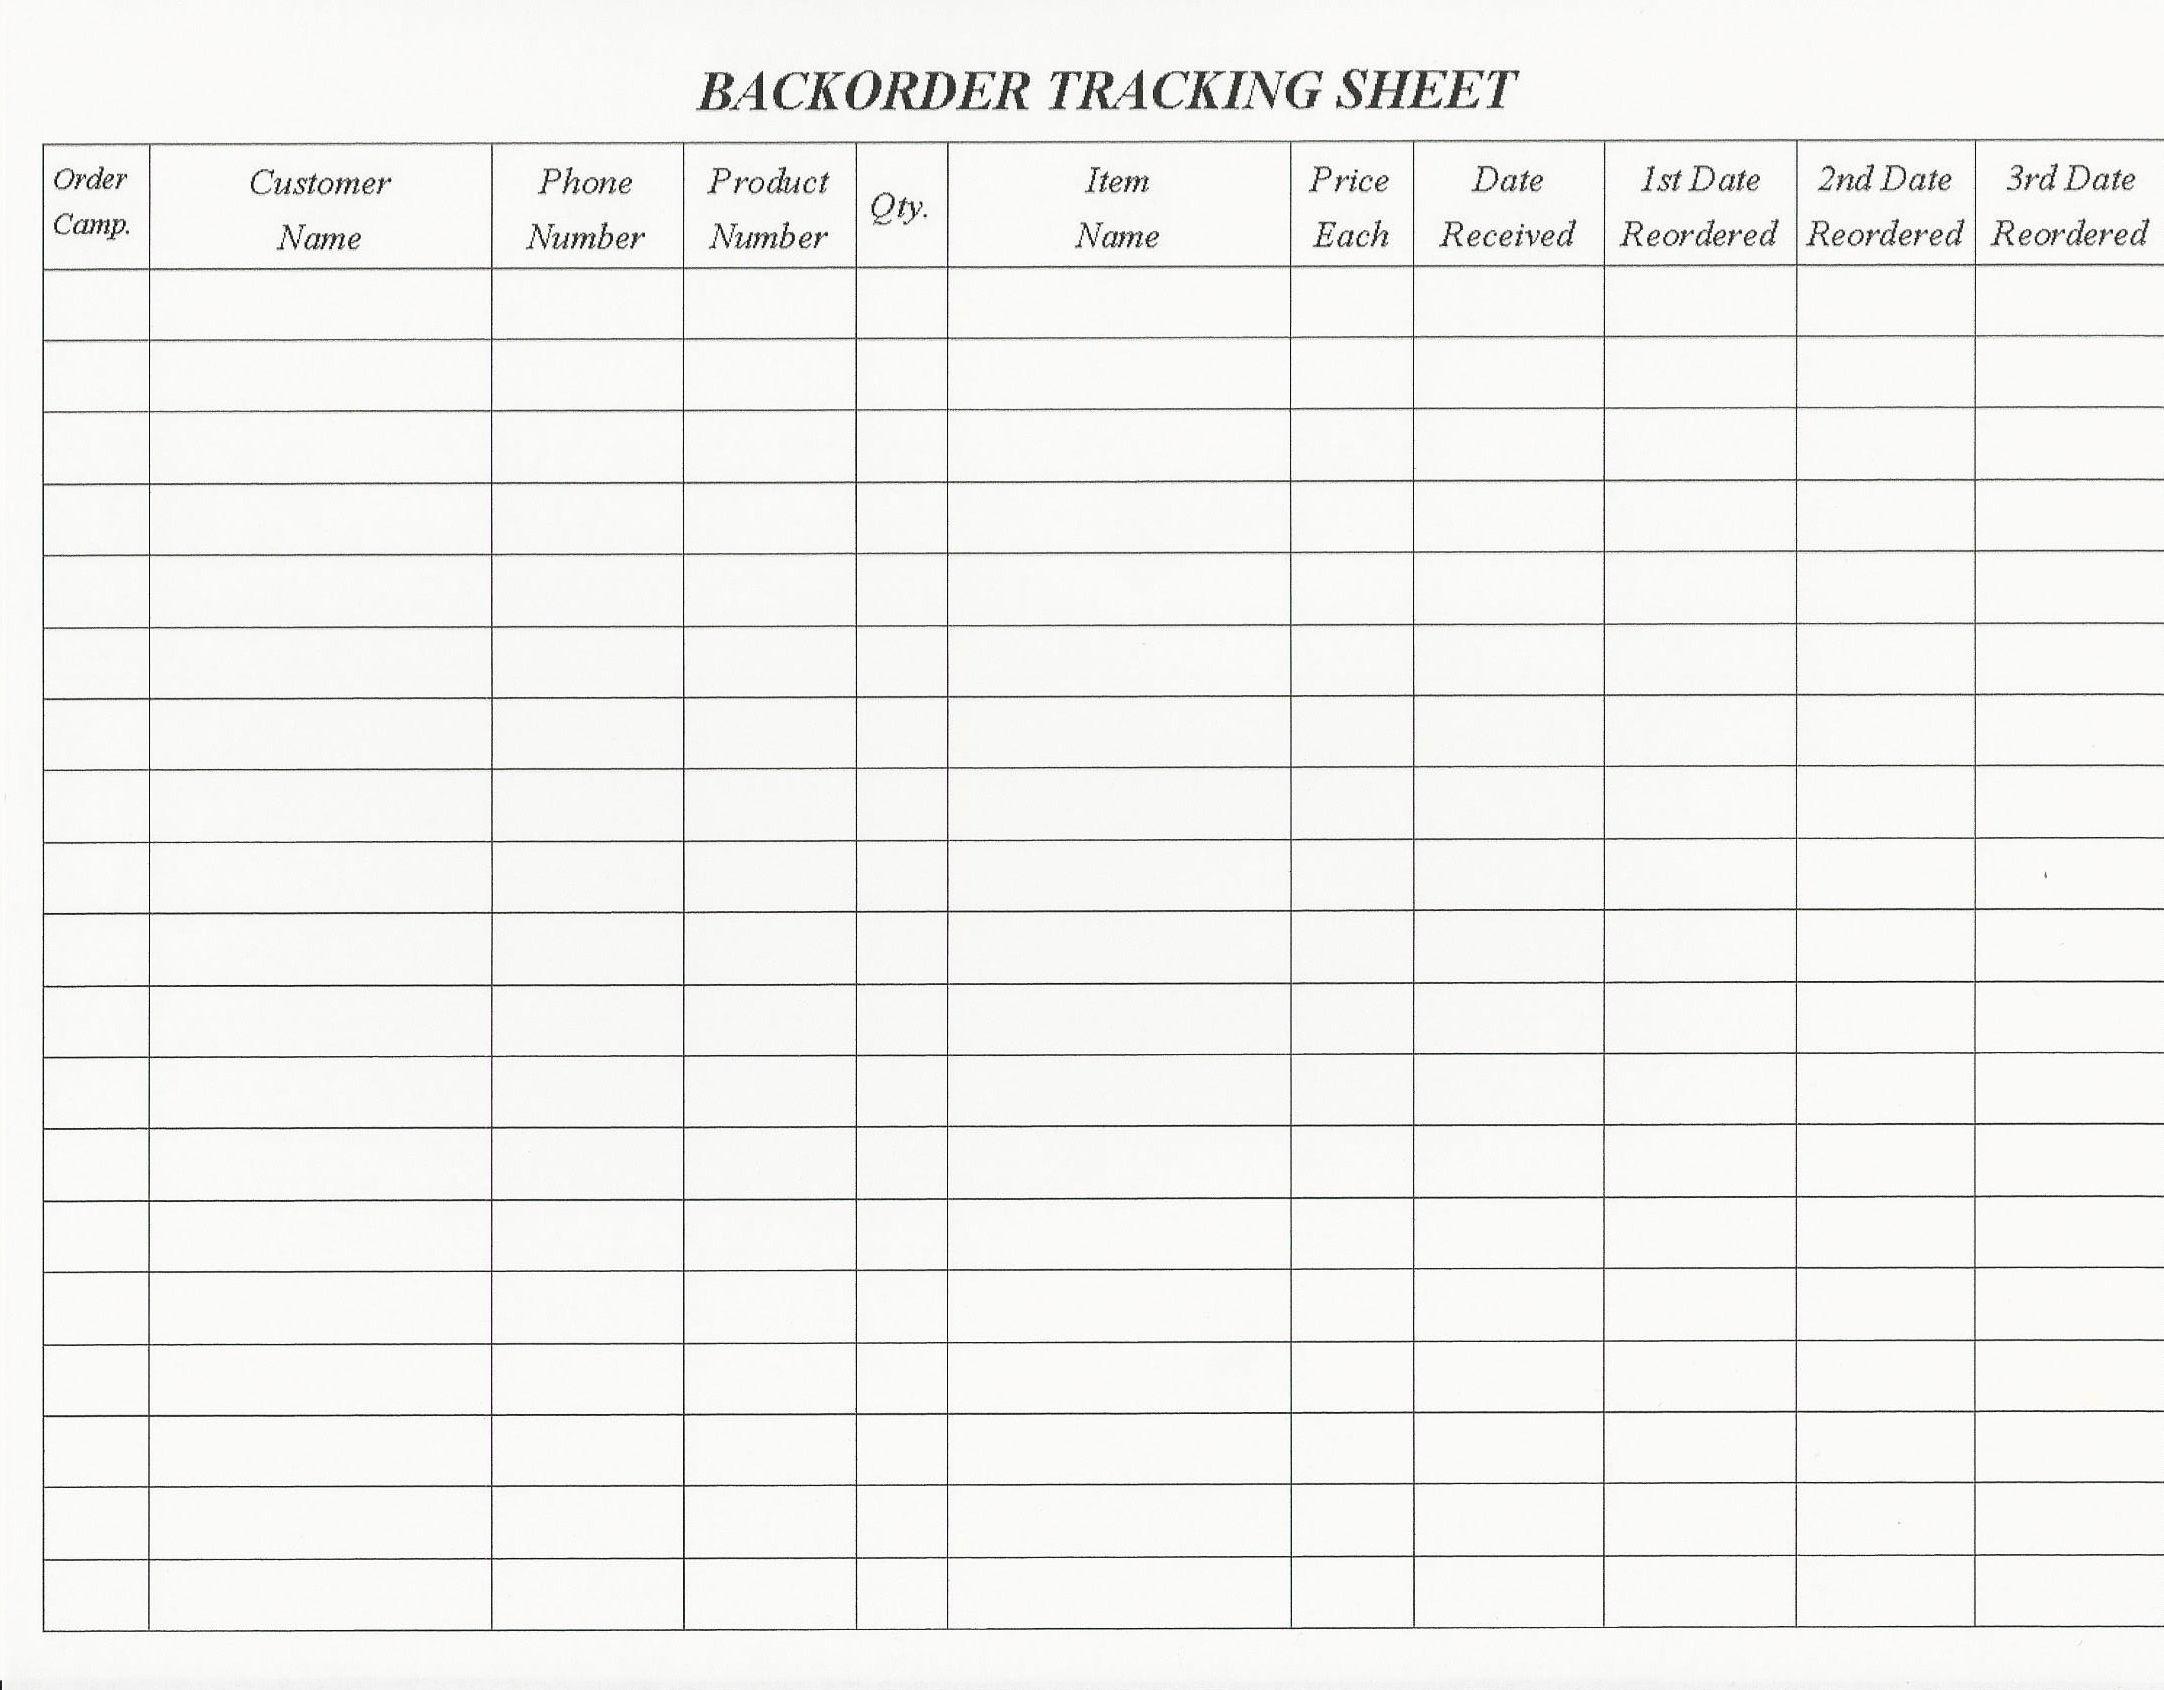 backorder tracking 2 164 1 690 pixels avon printables pinterest avon and avon sales. Black Bedroom Furniture Sets. Home Design Ideas